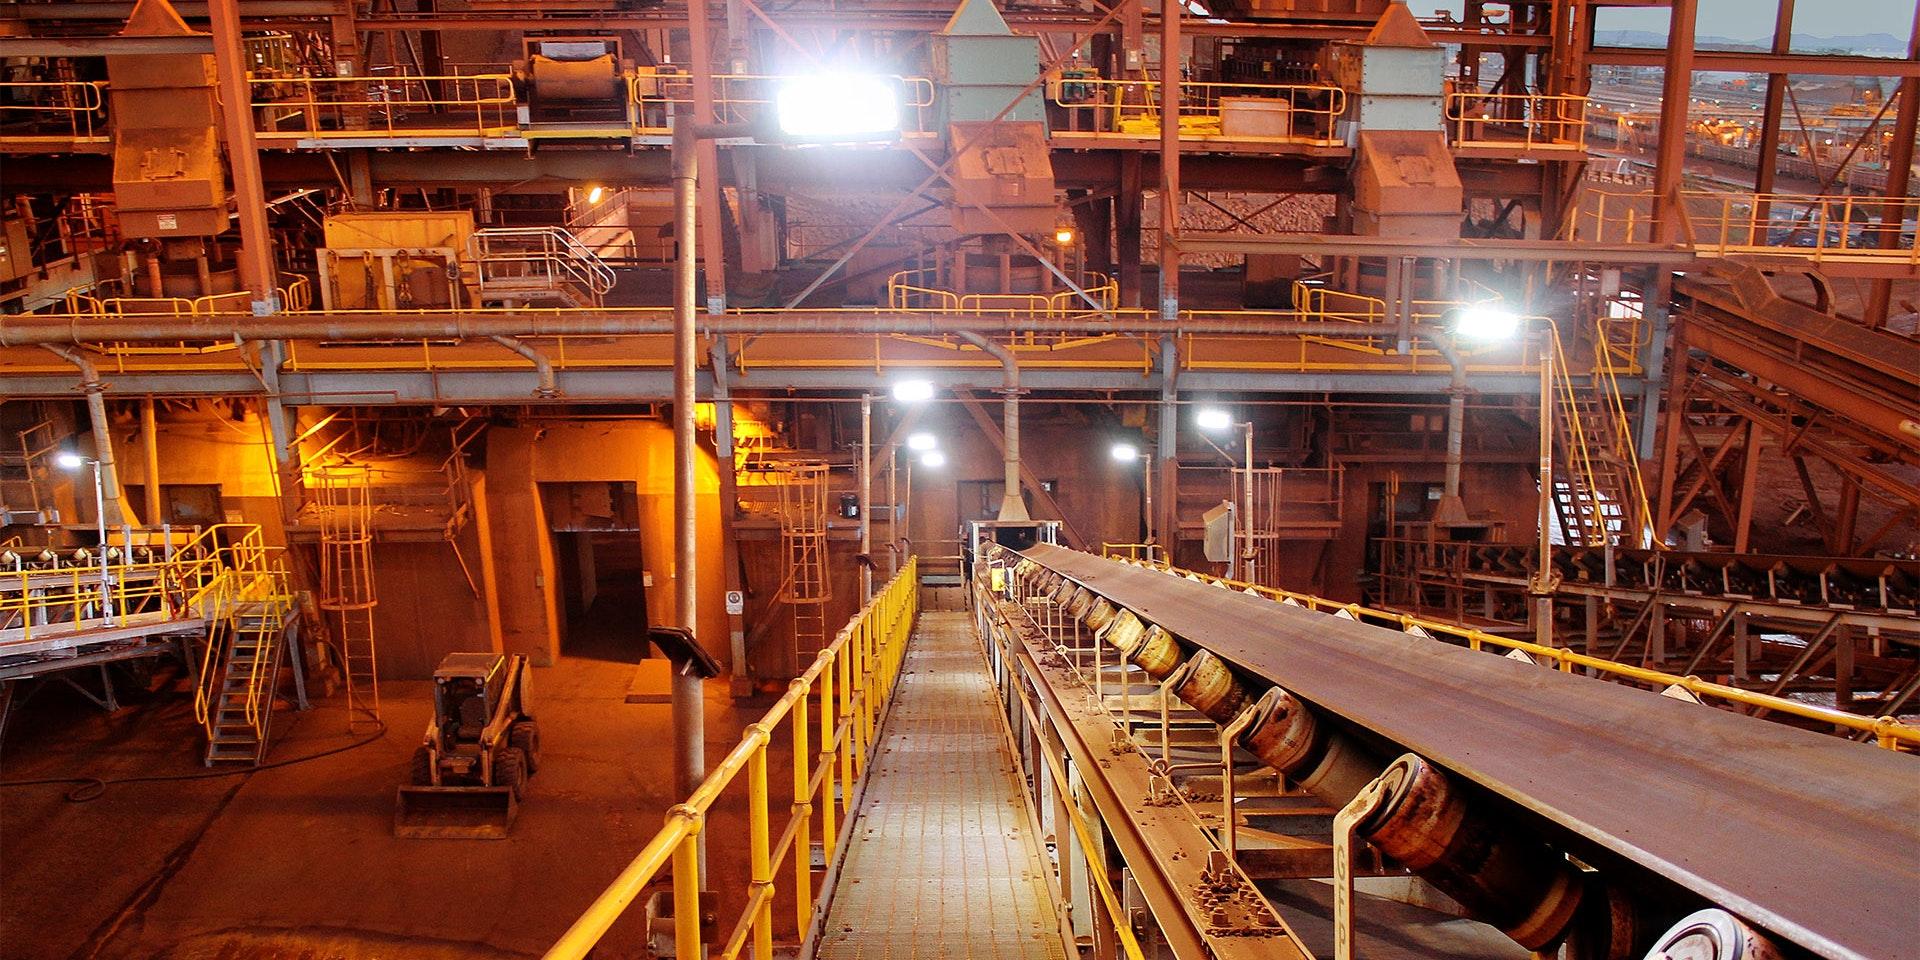 DLK LED Conveyor / Area Light in application, installed on a conveyor on an iron ore mine in bulk port